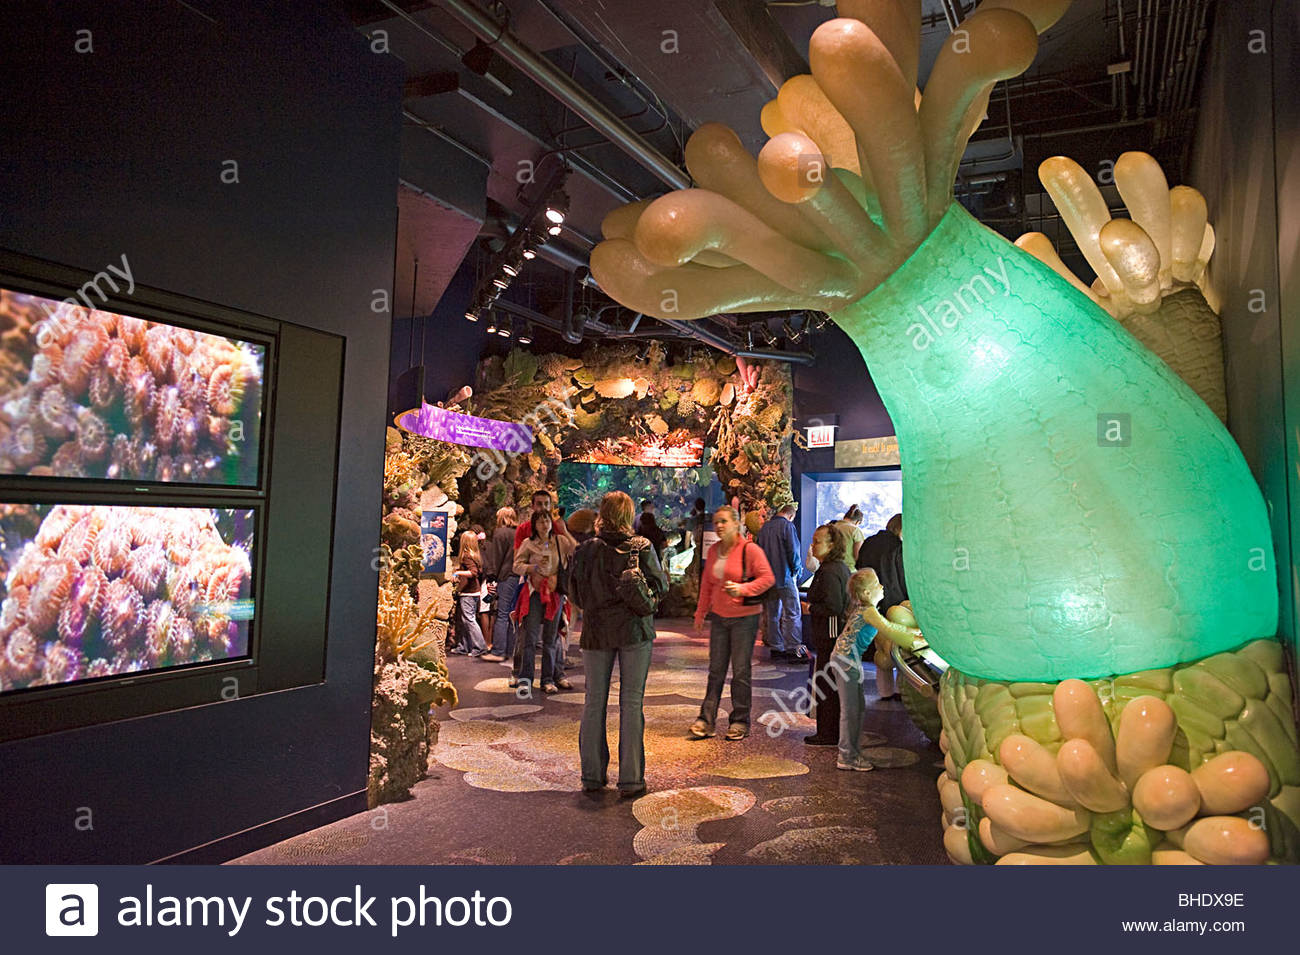 The Shedd Aquarium. Chicago, Illinois, usa - Stock Image